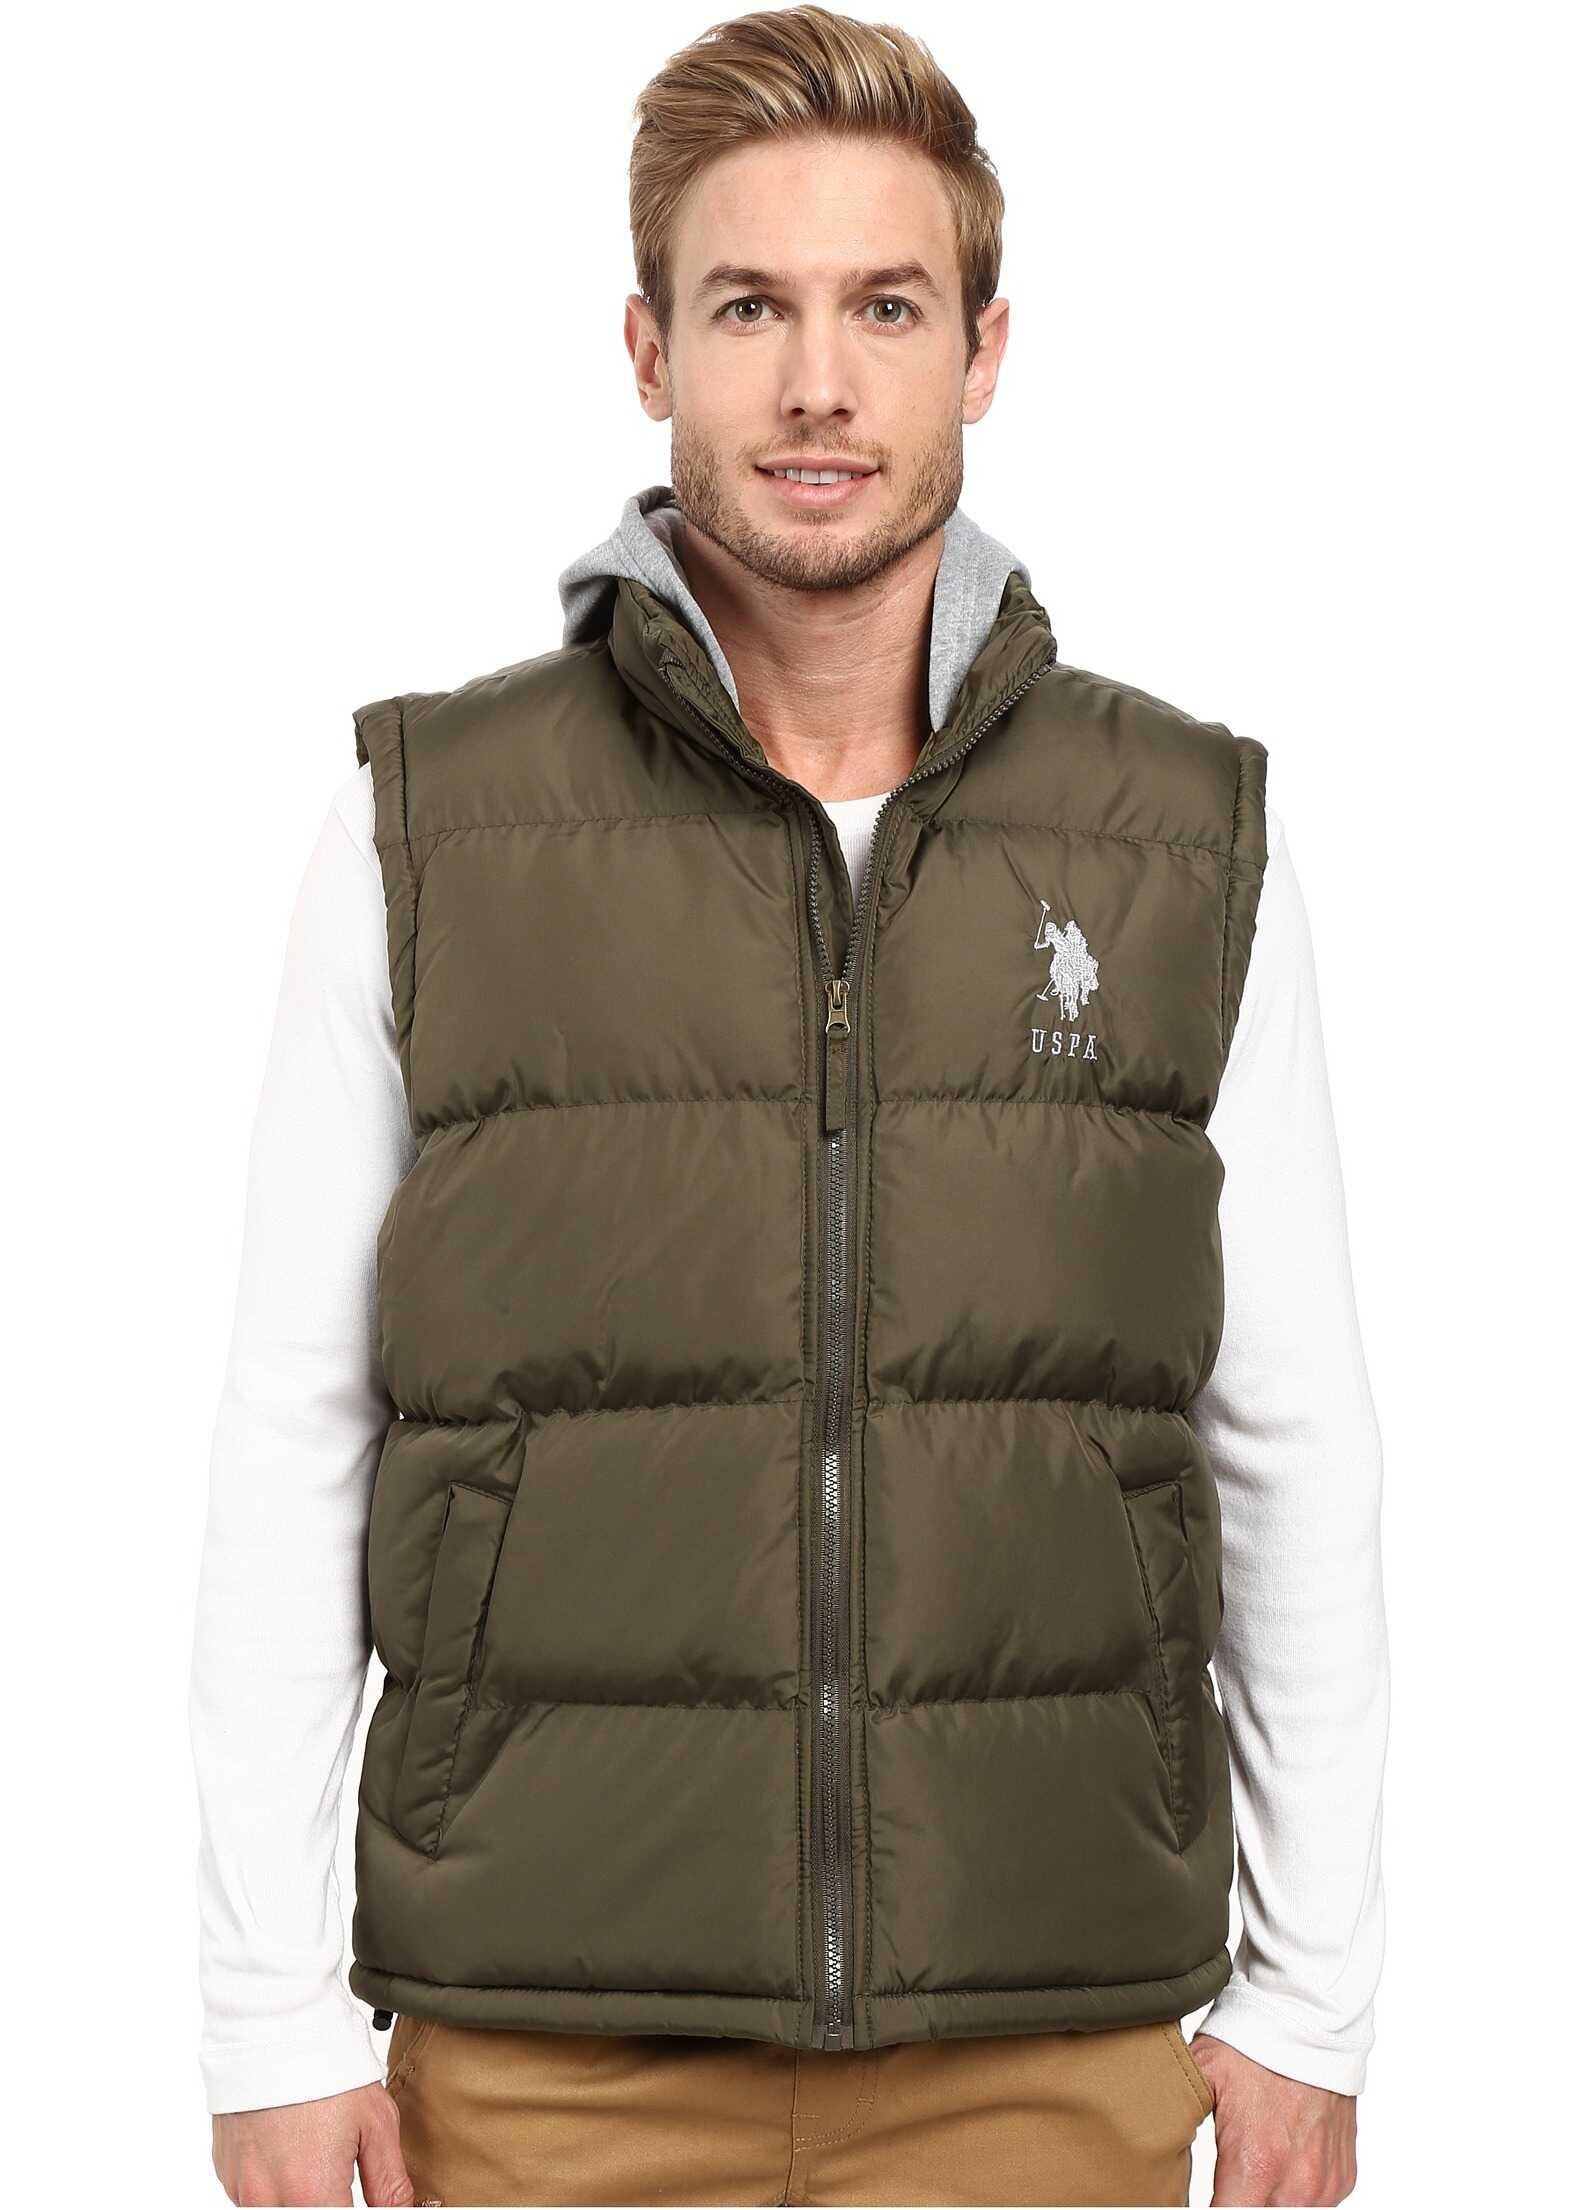 U.S. POLO ASSN. Basic Puffer Vest with Fleece Hood Forest Night